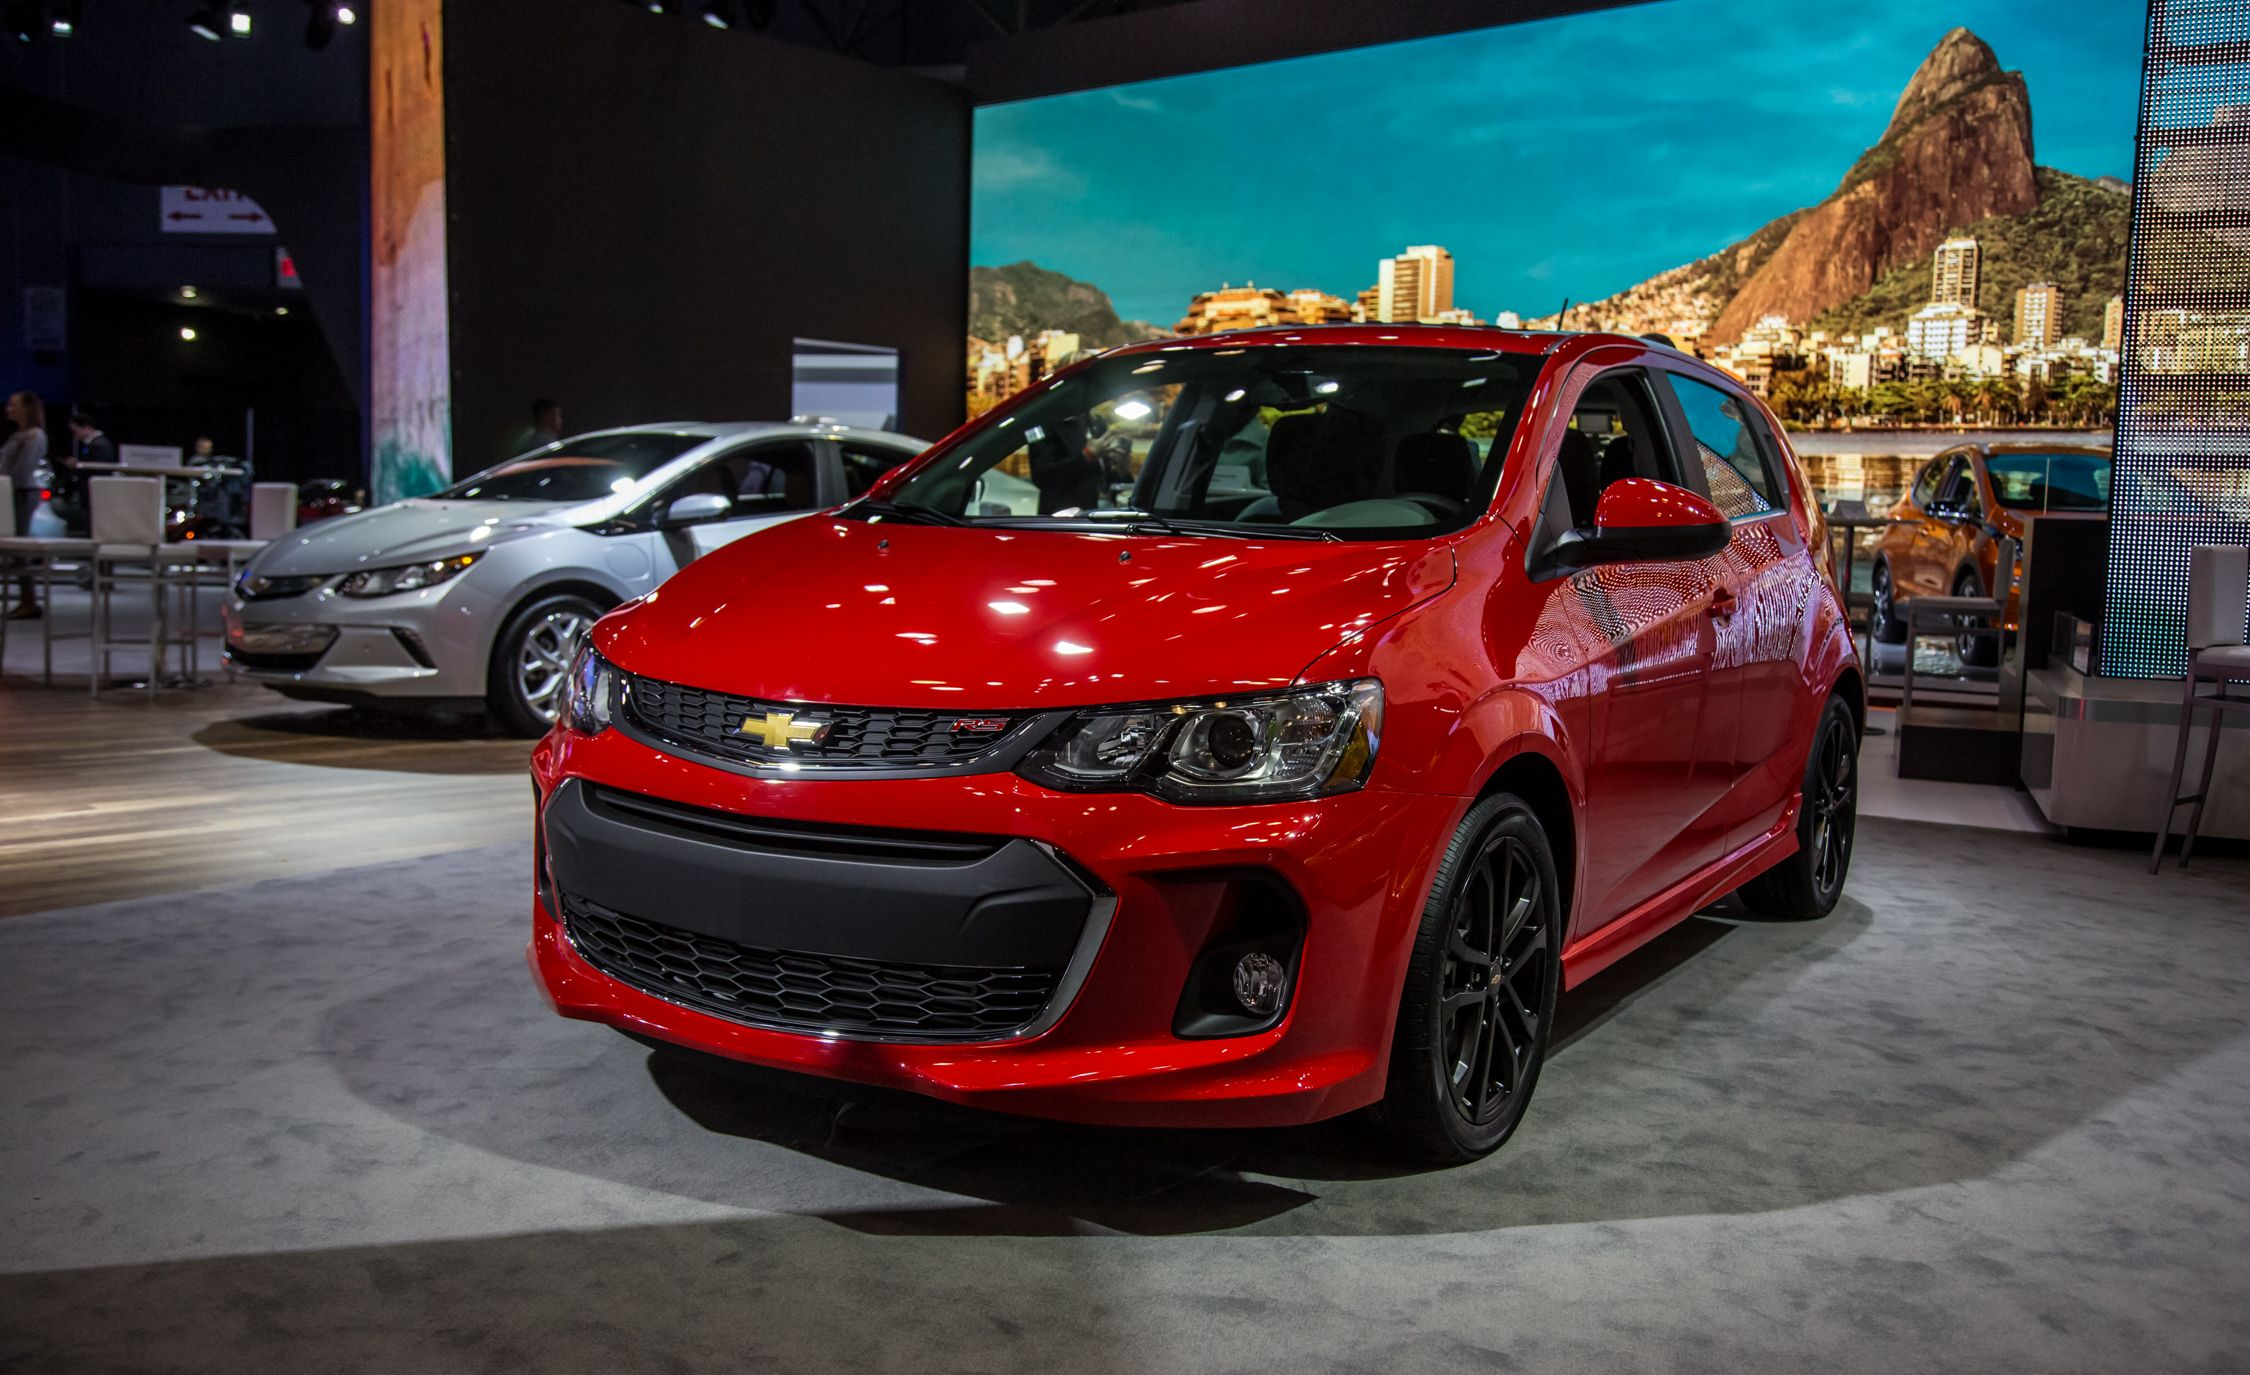 2018 Chevrolet Sonic Price >> 2019 Chevrolet Sonic Reviews Chevrolet Sonic Price Photos And